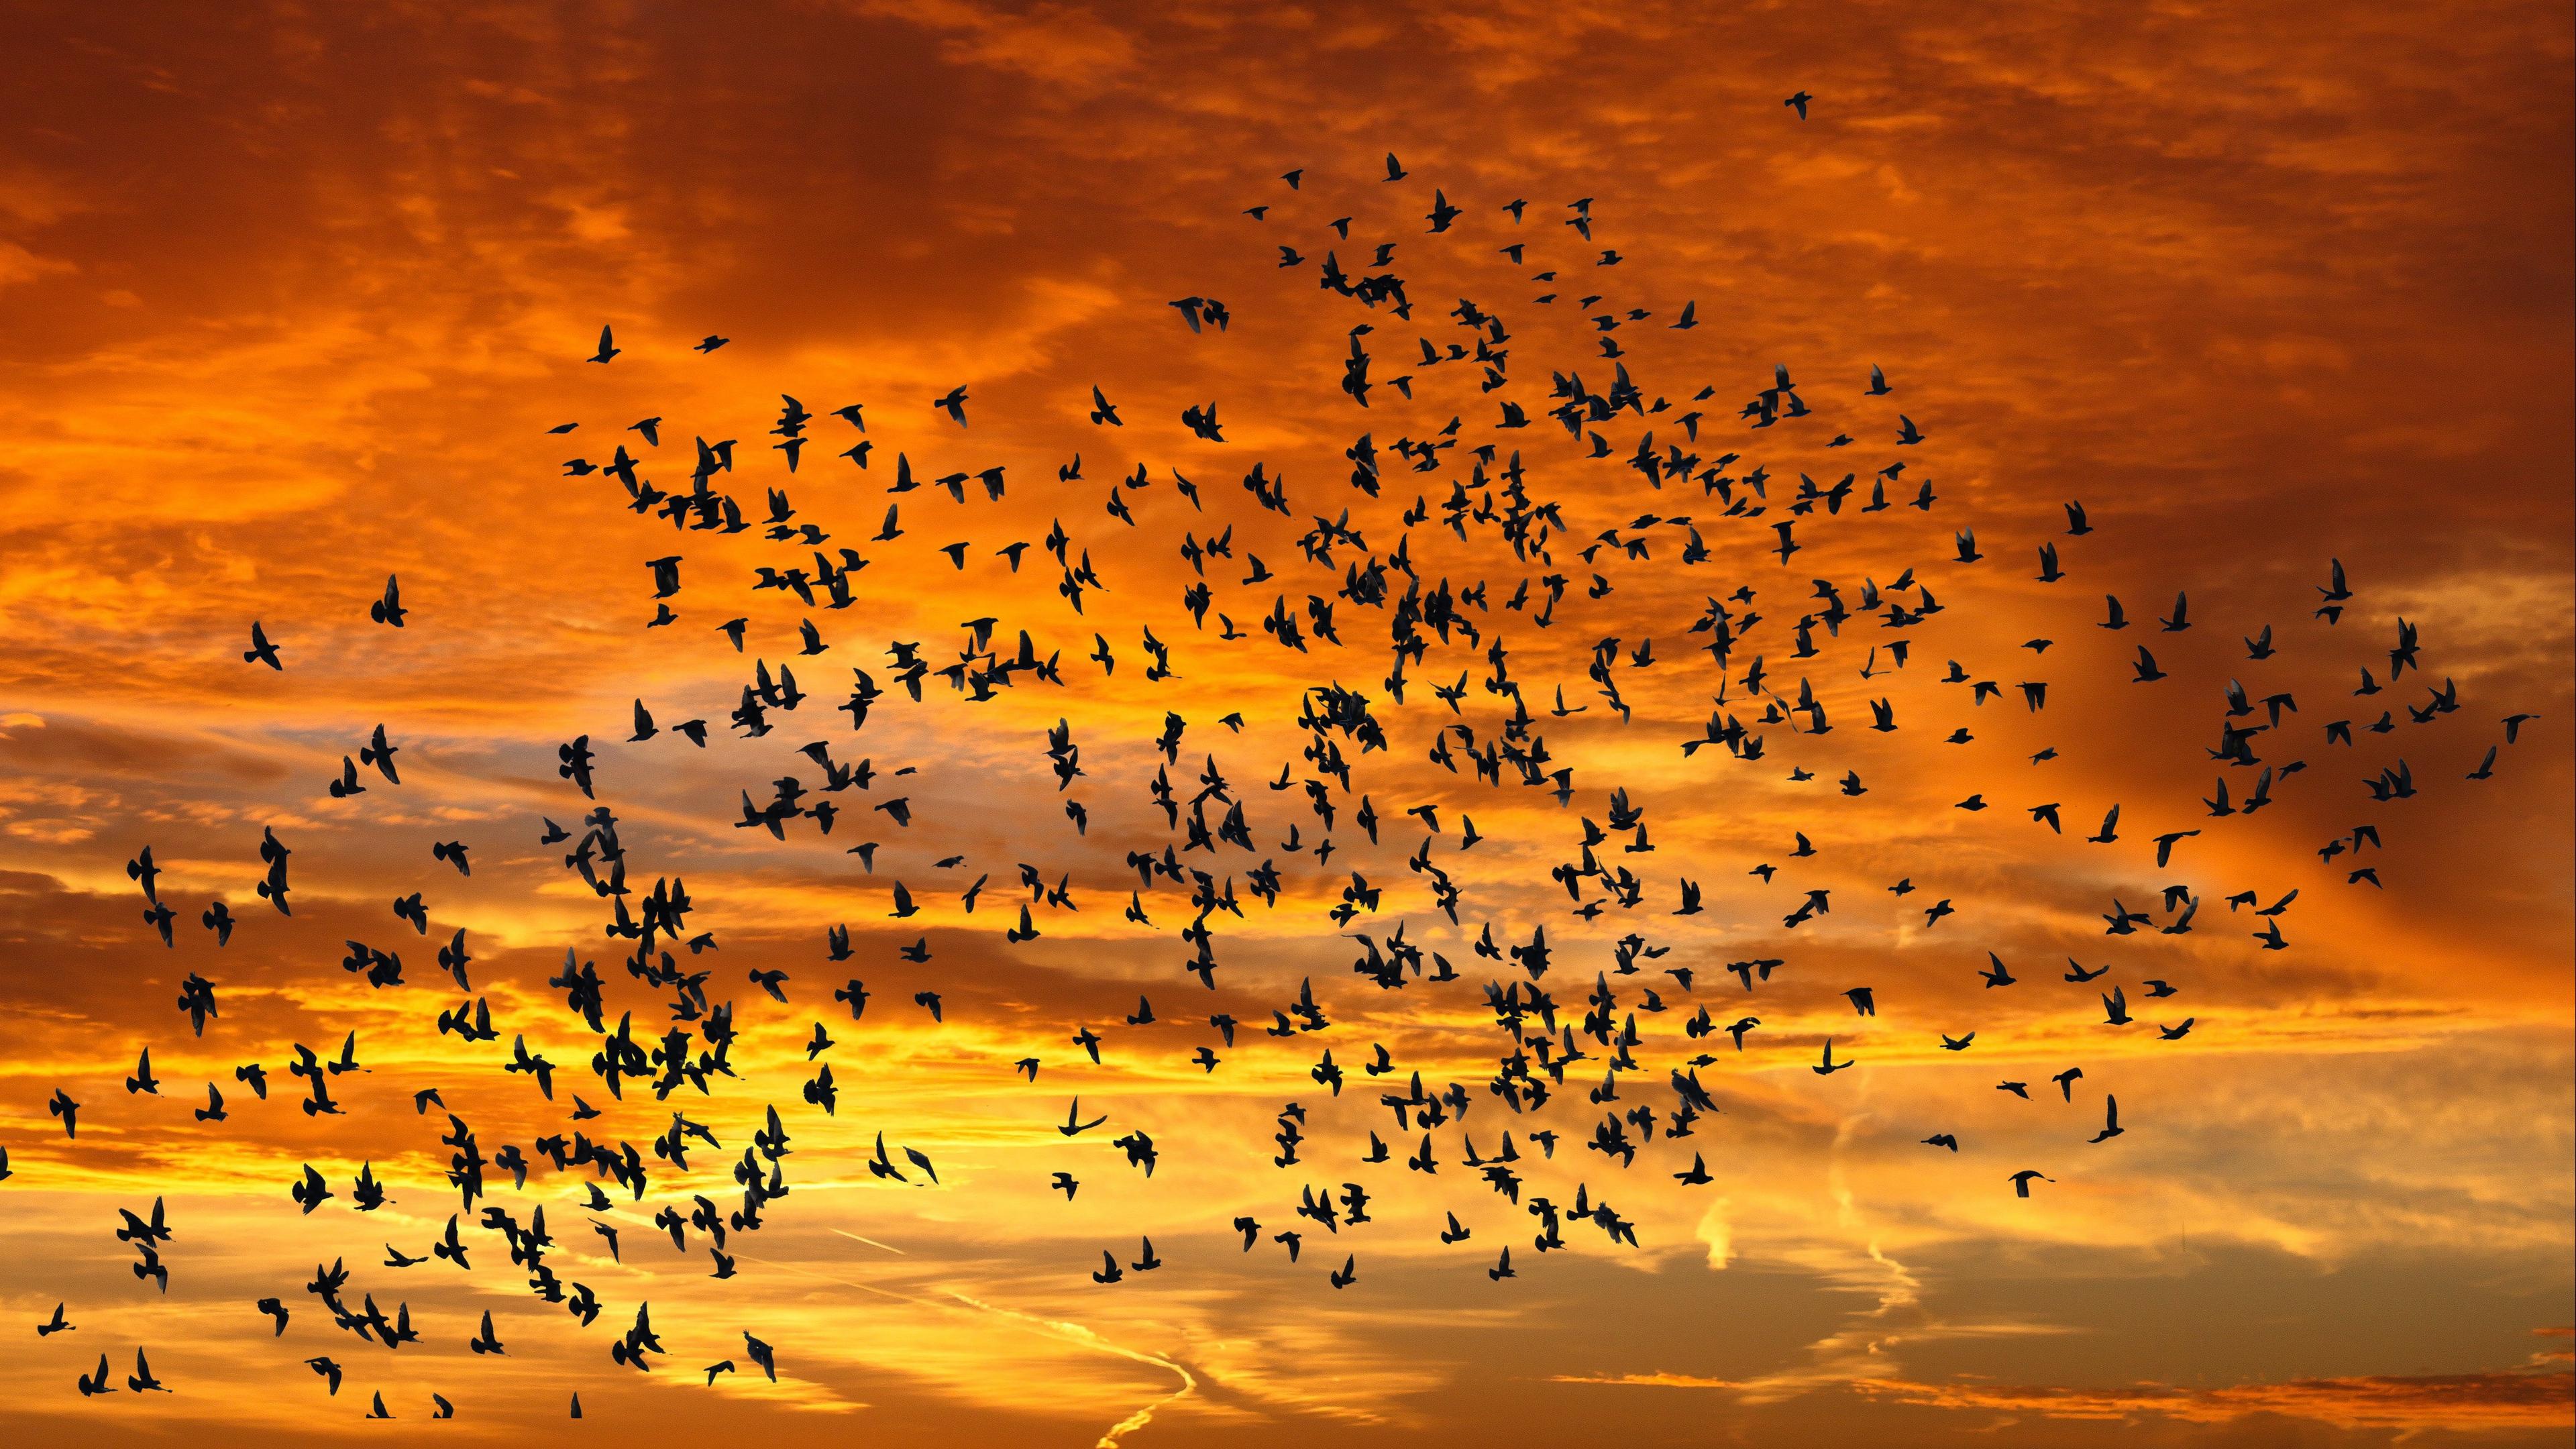 birds silhouettes sky flight sunset clouds 4k 1541116657 - birds, silhouettes, sky, flight, sunset, clouds 4k - Sky, silhouettes, Birds